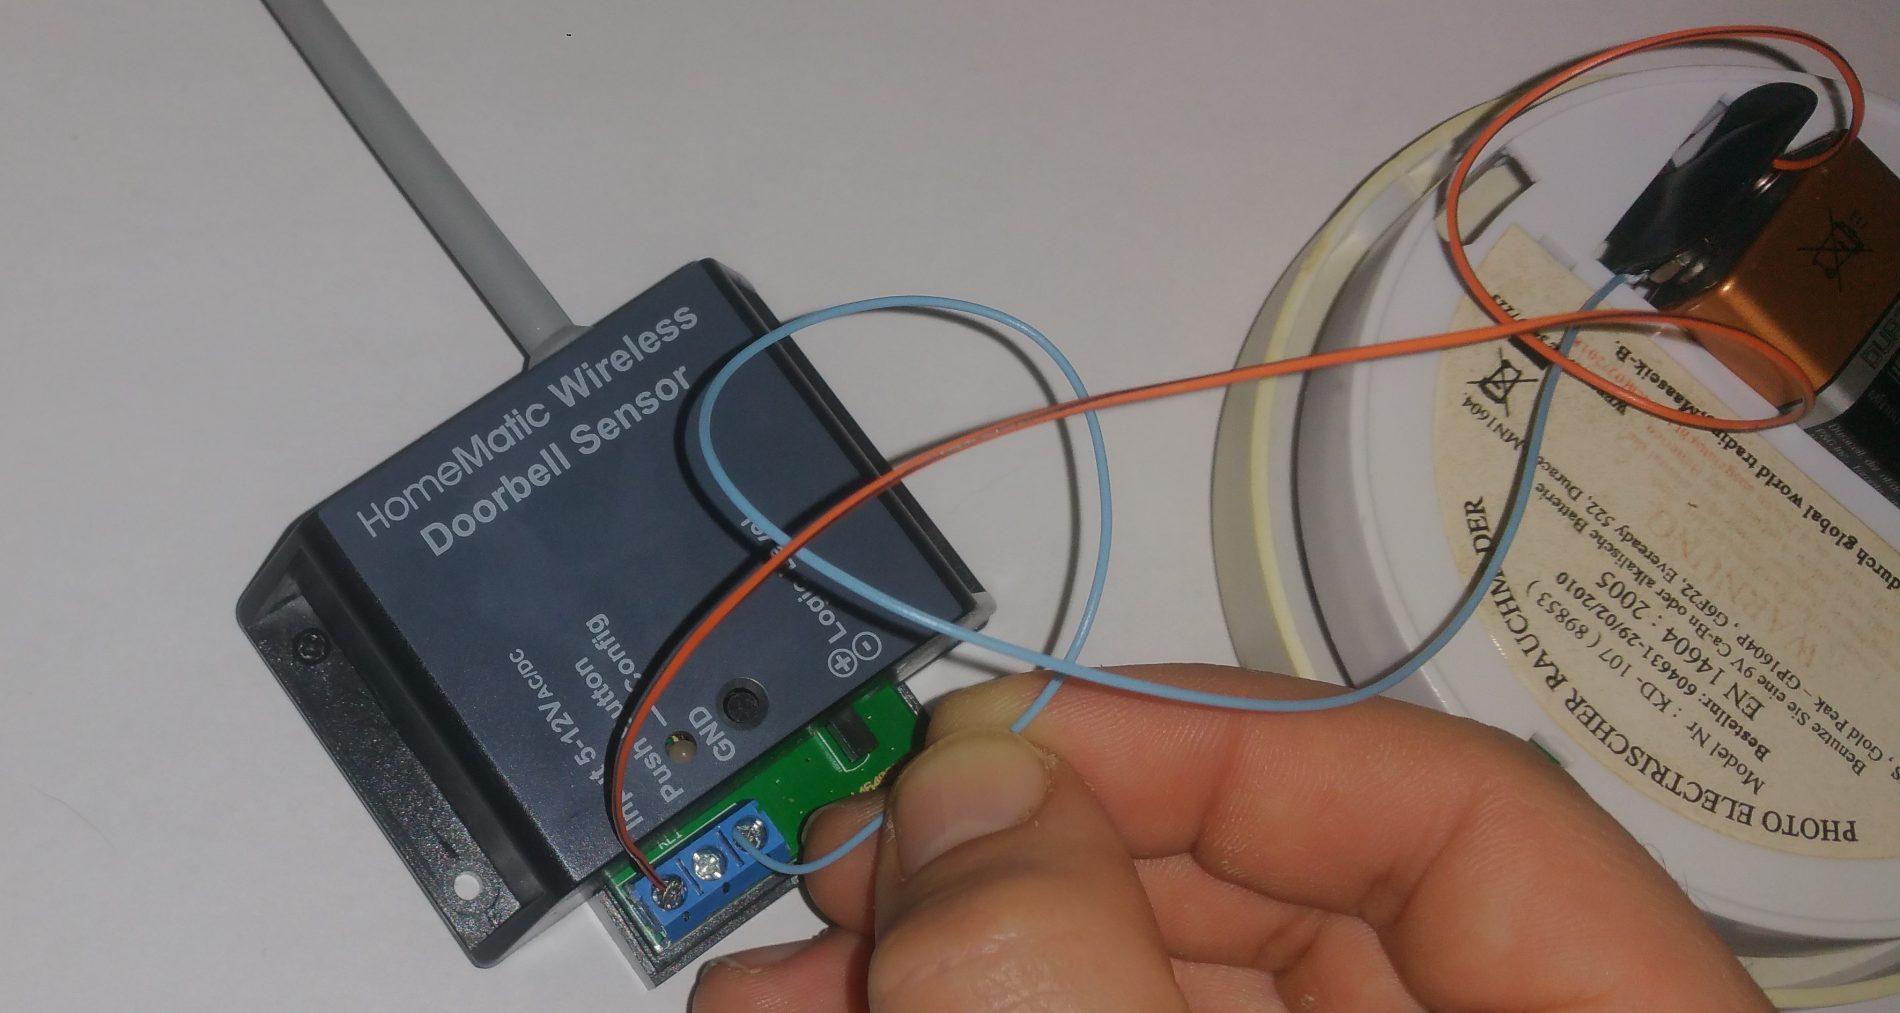 HM-Sen-Db-Pcb-Funktionstest 9VBlock FHEM